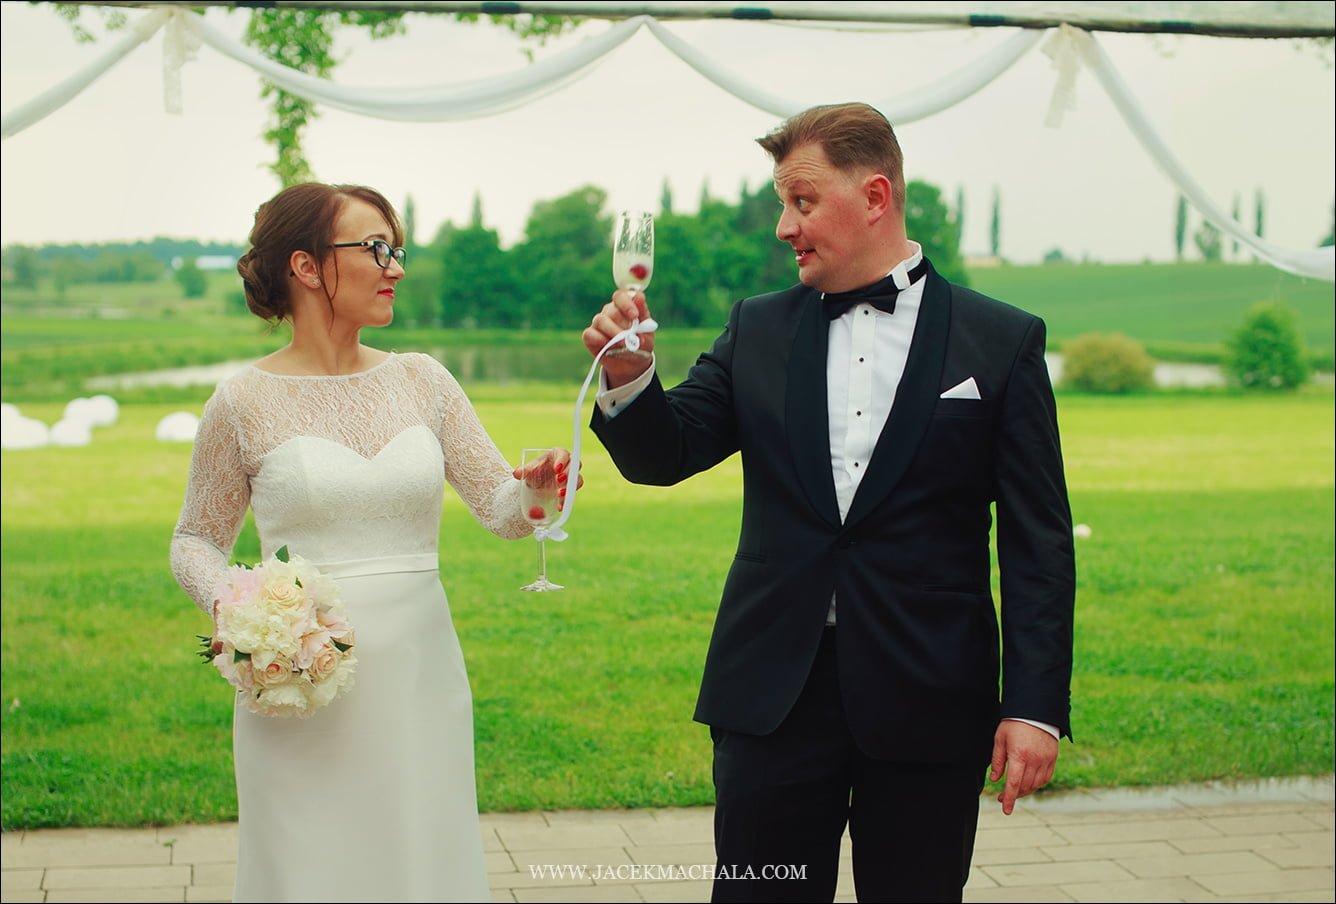 fotograf bielsko biala aga i piotr 63 - Willa Słoneczna - AGA & PIOTR